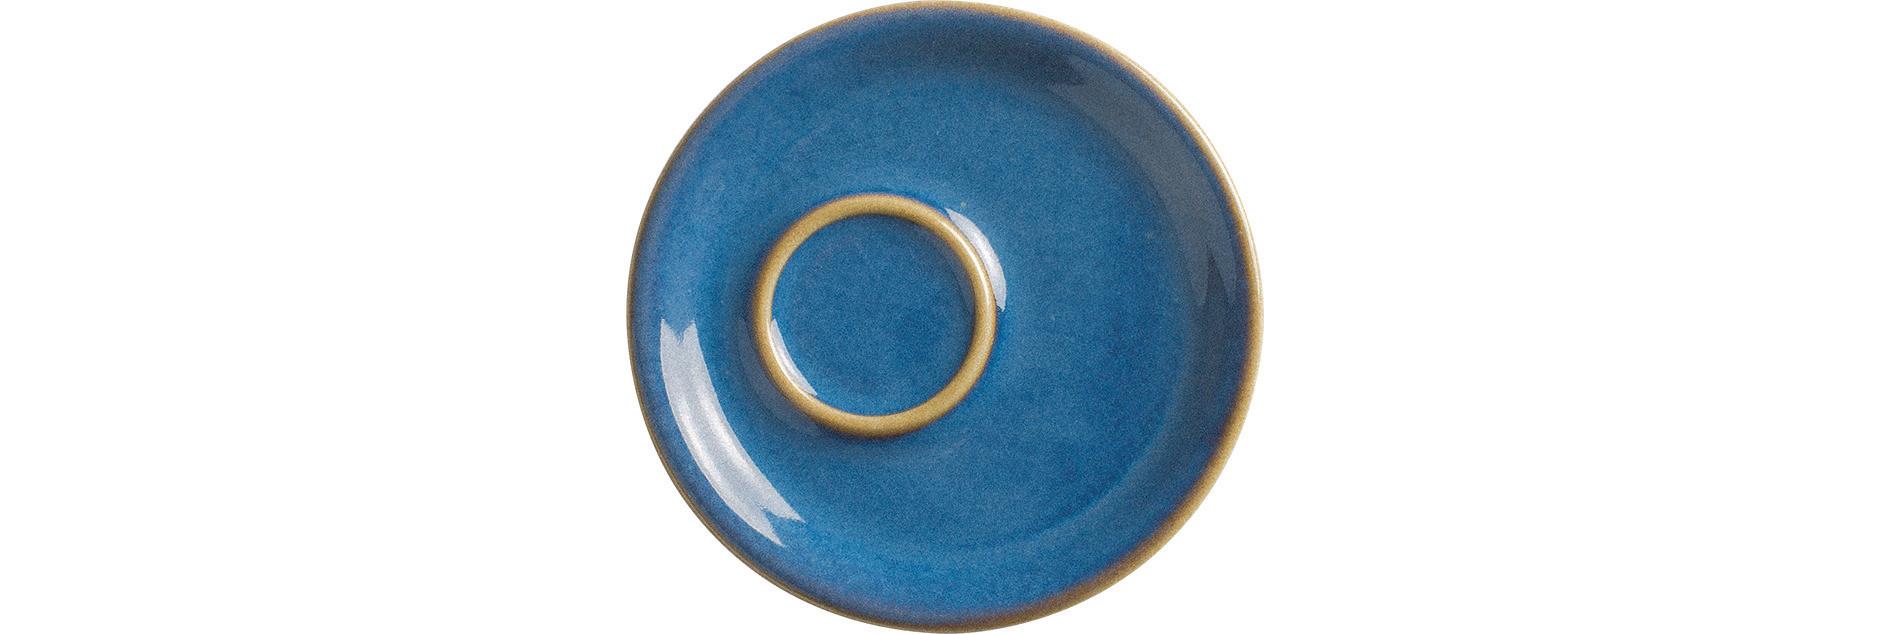 Homestyle, Espresso Untertasse ø 115 mm atlantic blue